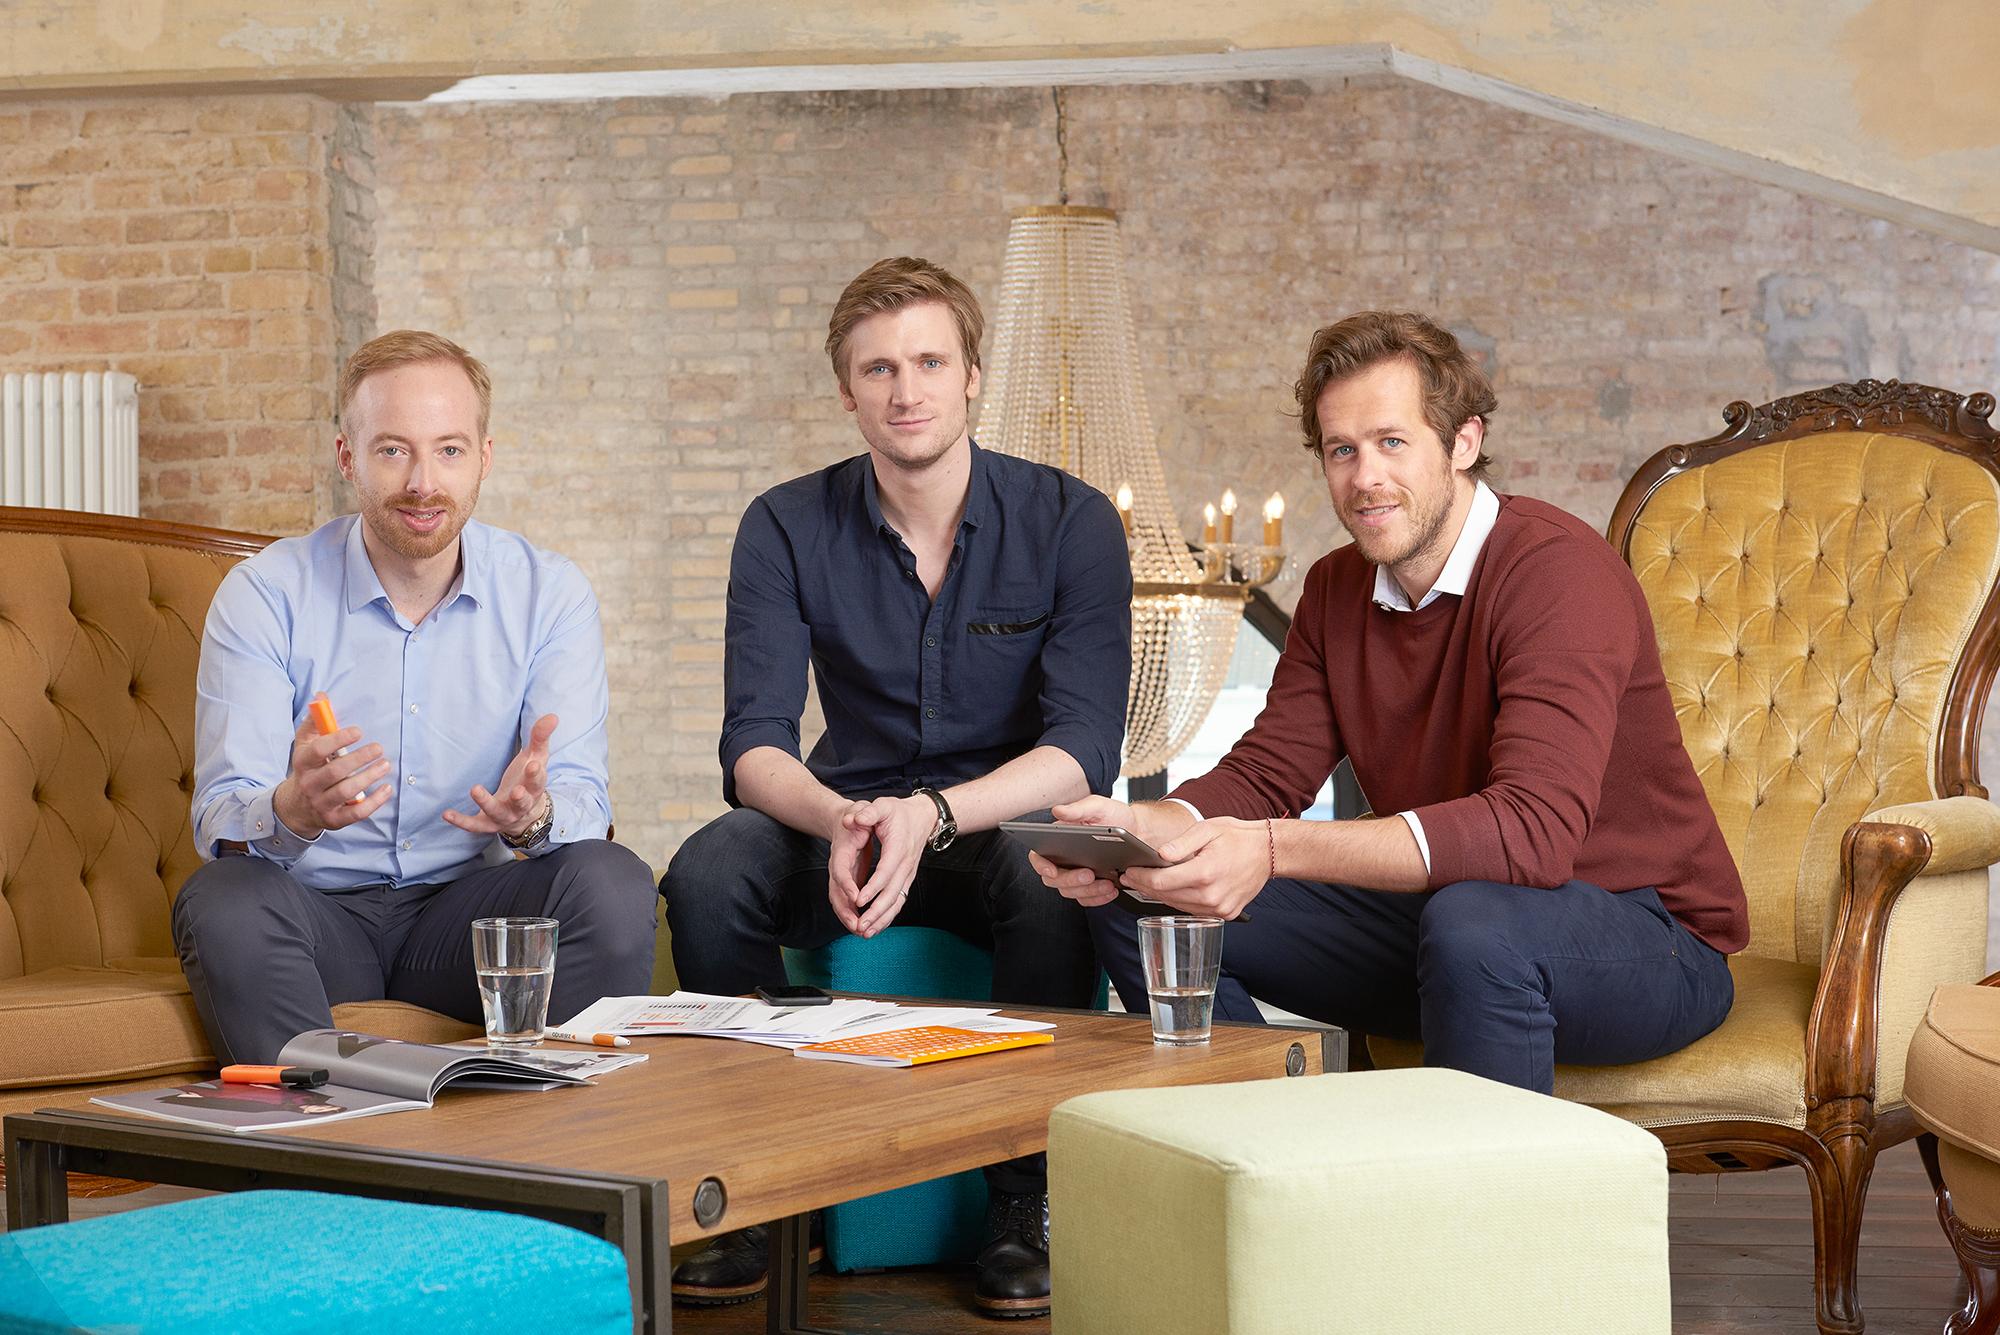 Zalando Vorstand (Rubin Ritter, Robert Gentz & David Schneider) - Bild: Zalando